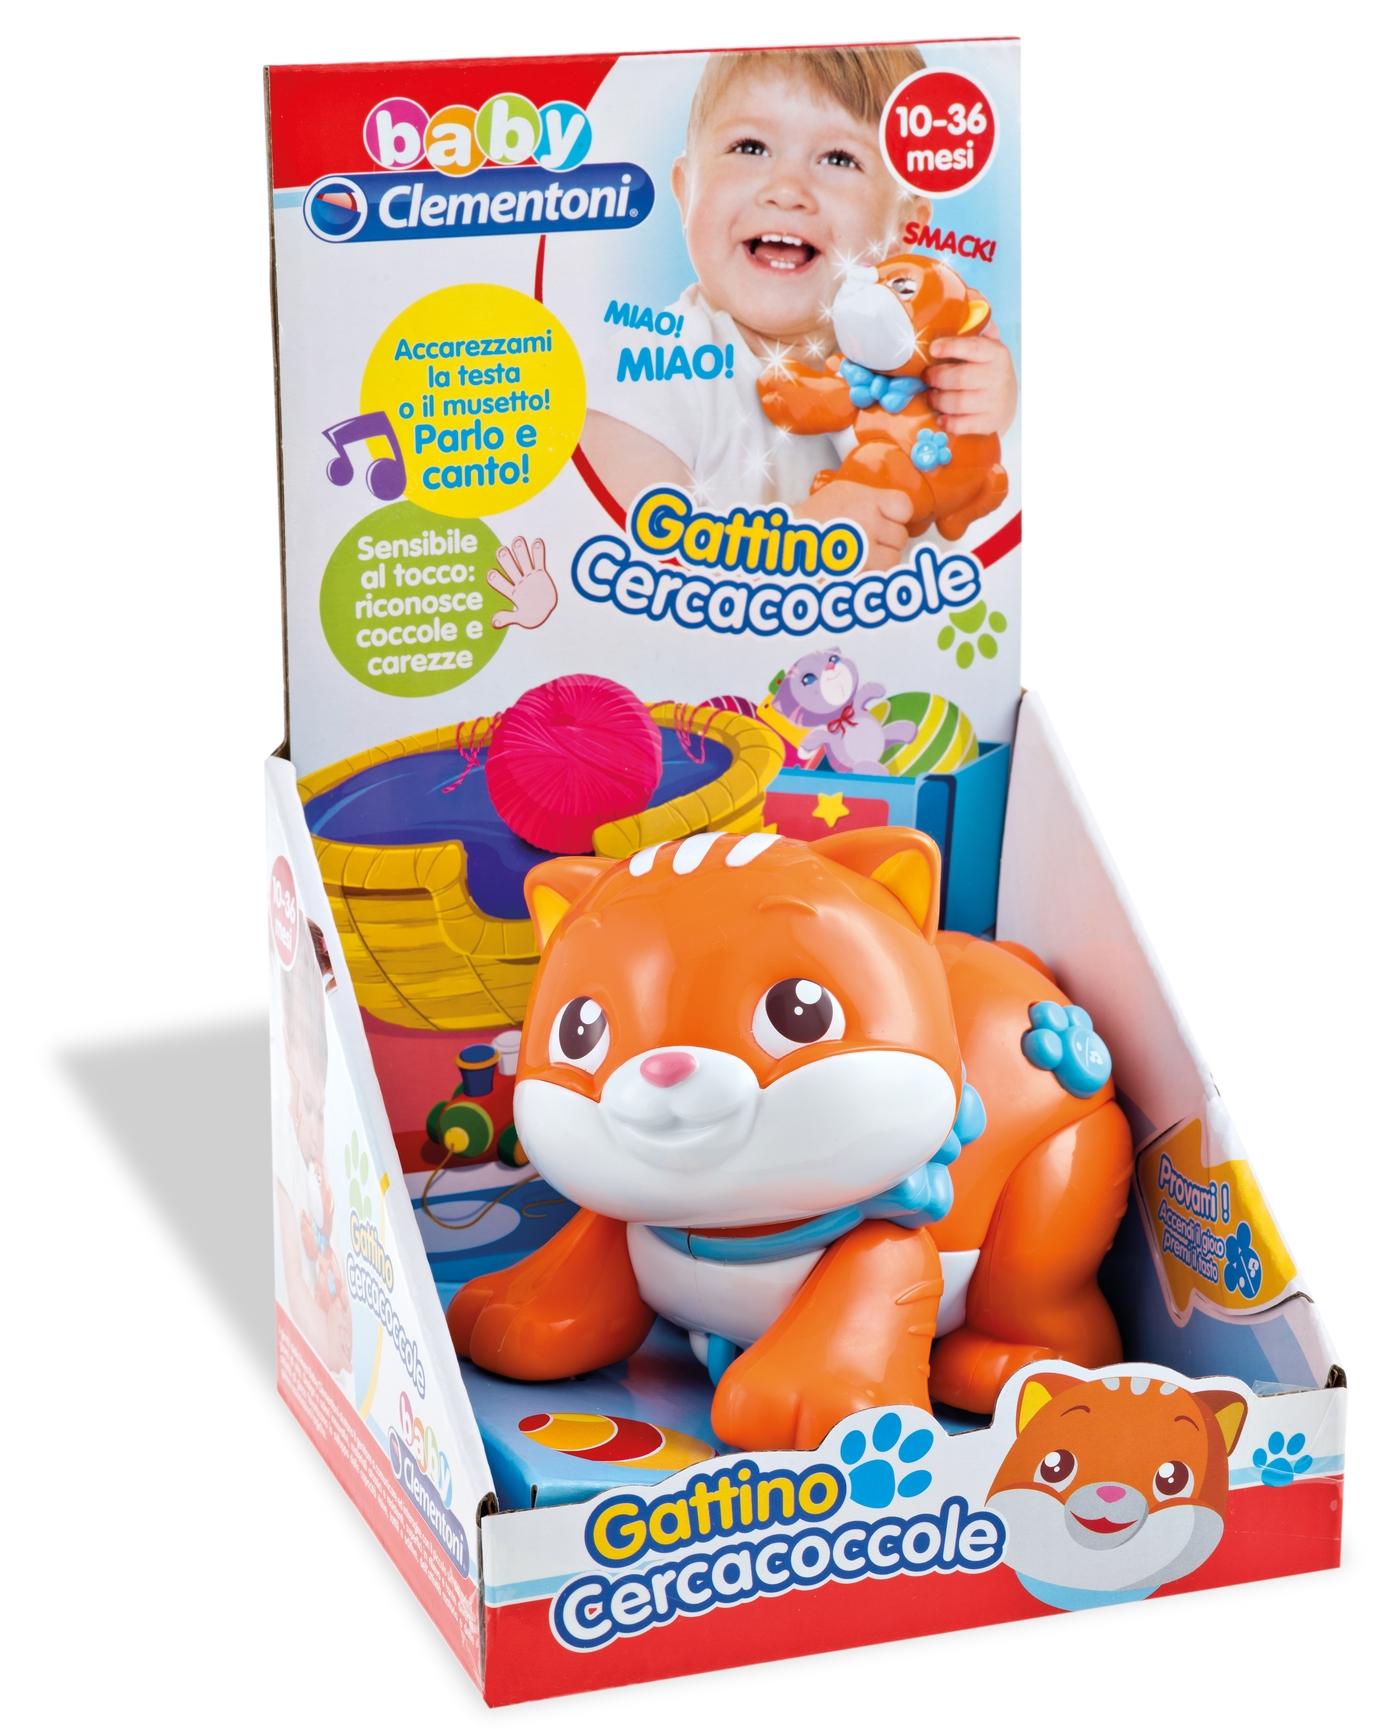 c3f7d84e26 baby clementoni gattino cercacoccole - CirinaroShopCirinaroShop